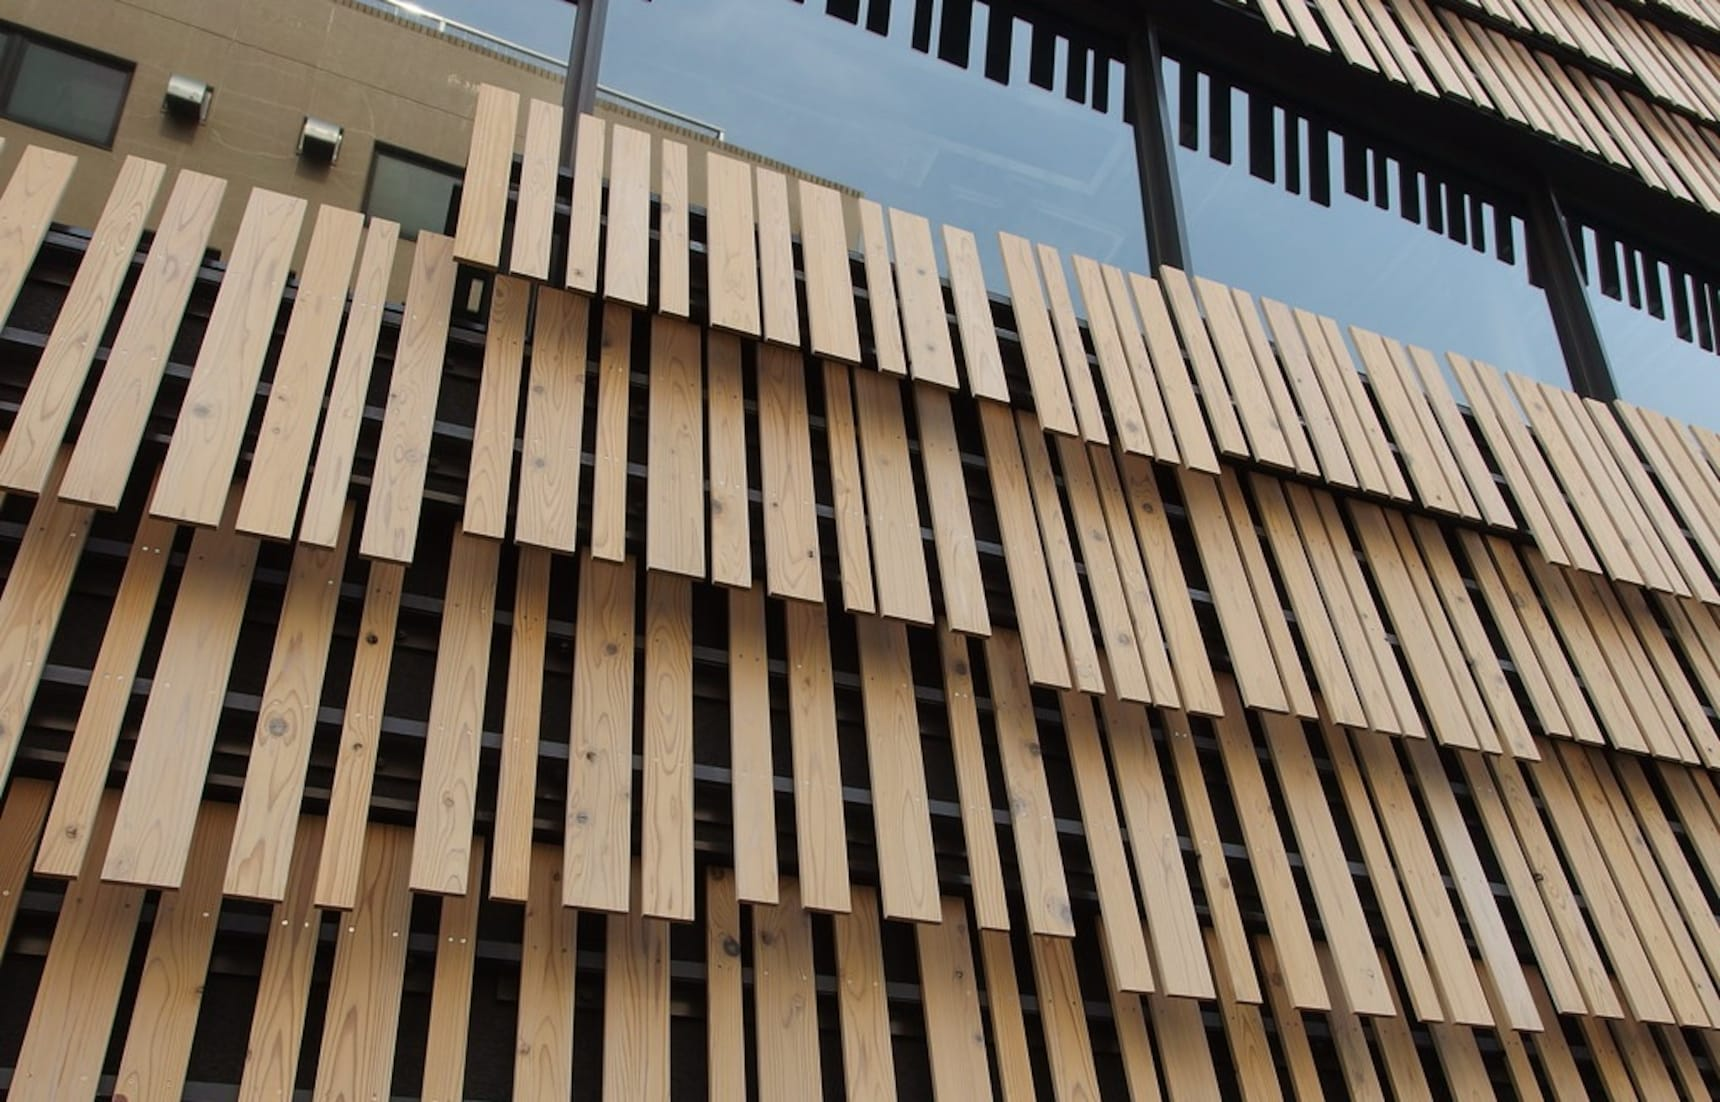 Top 10 Kengo Kuma Buildings in Tokyo